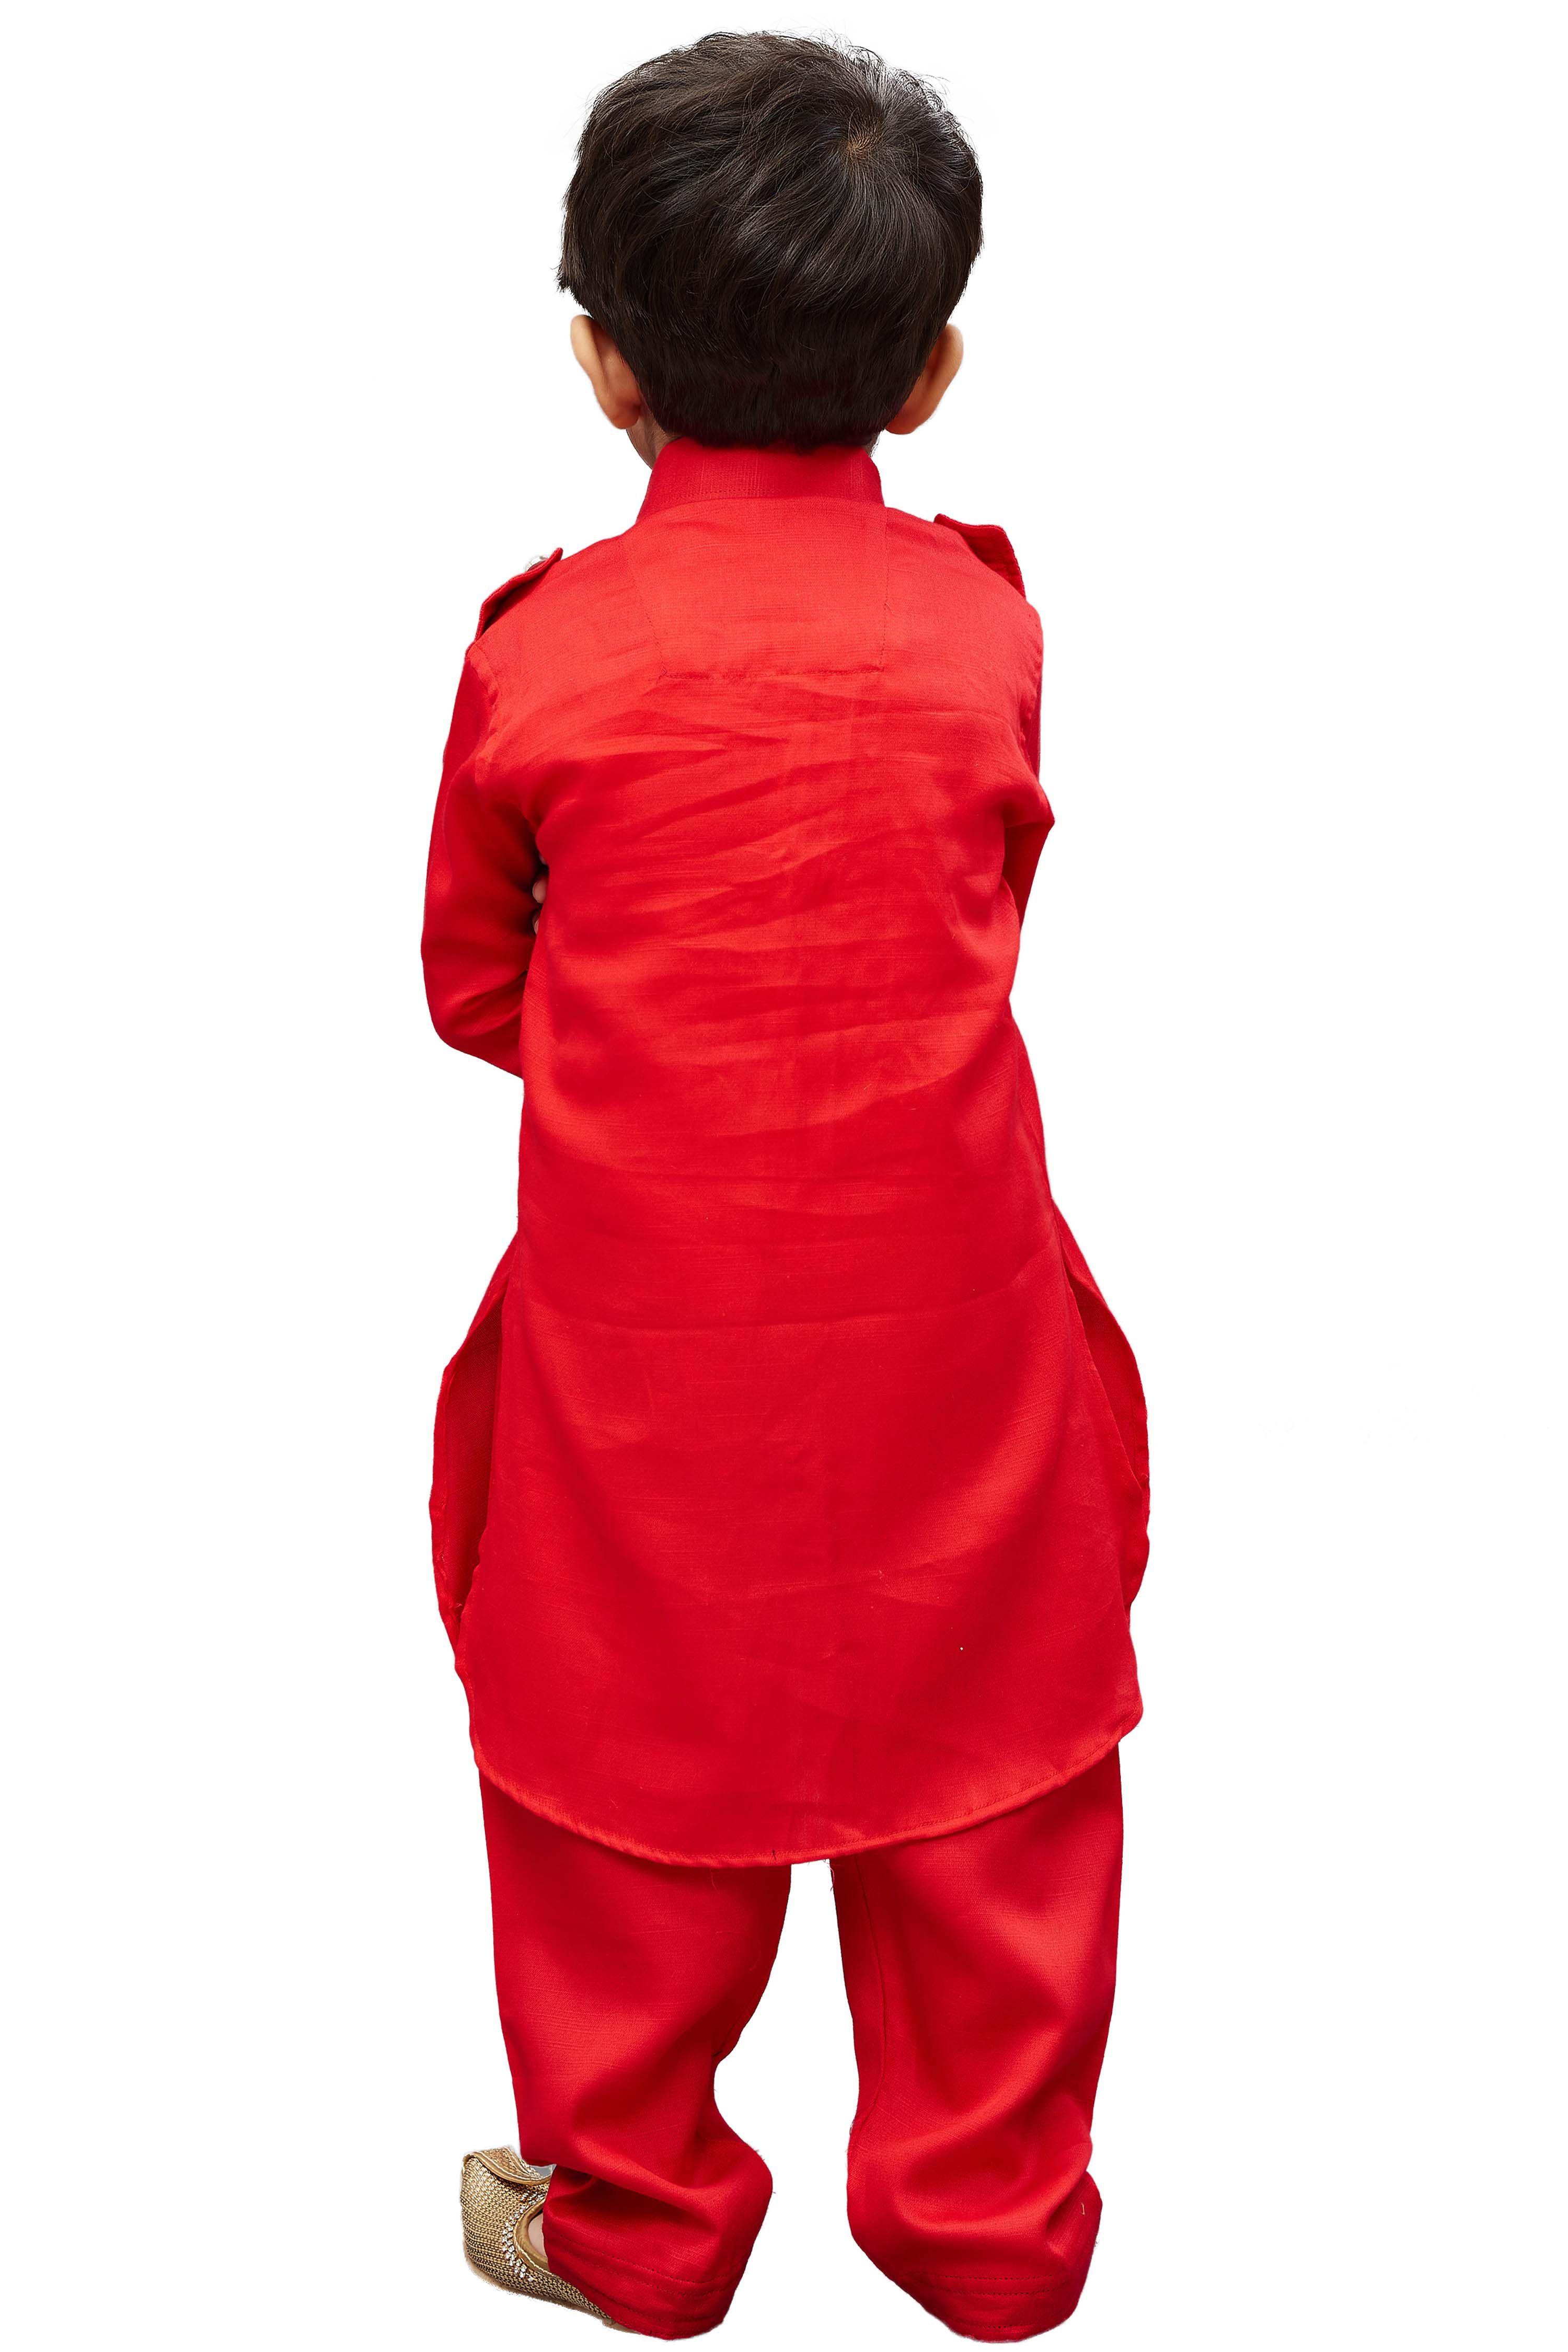 3a945a468 JBN Creation Boys  Red Cotton Pathani Khan Suit Set - Buy JBN ...